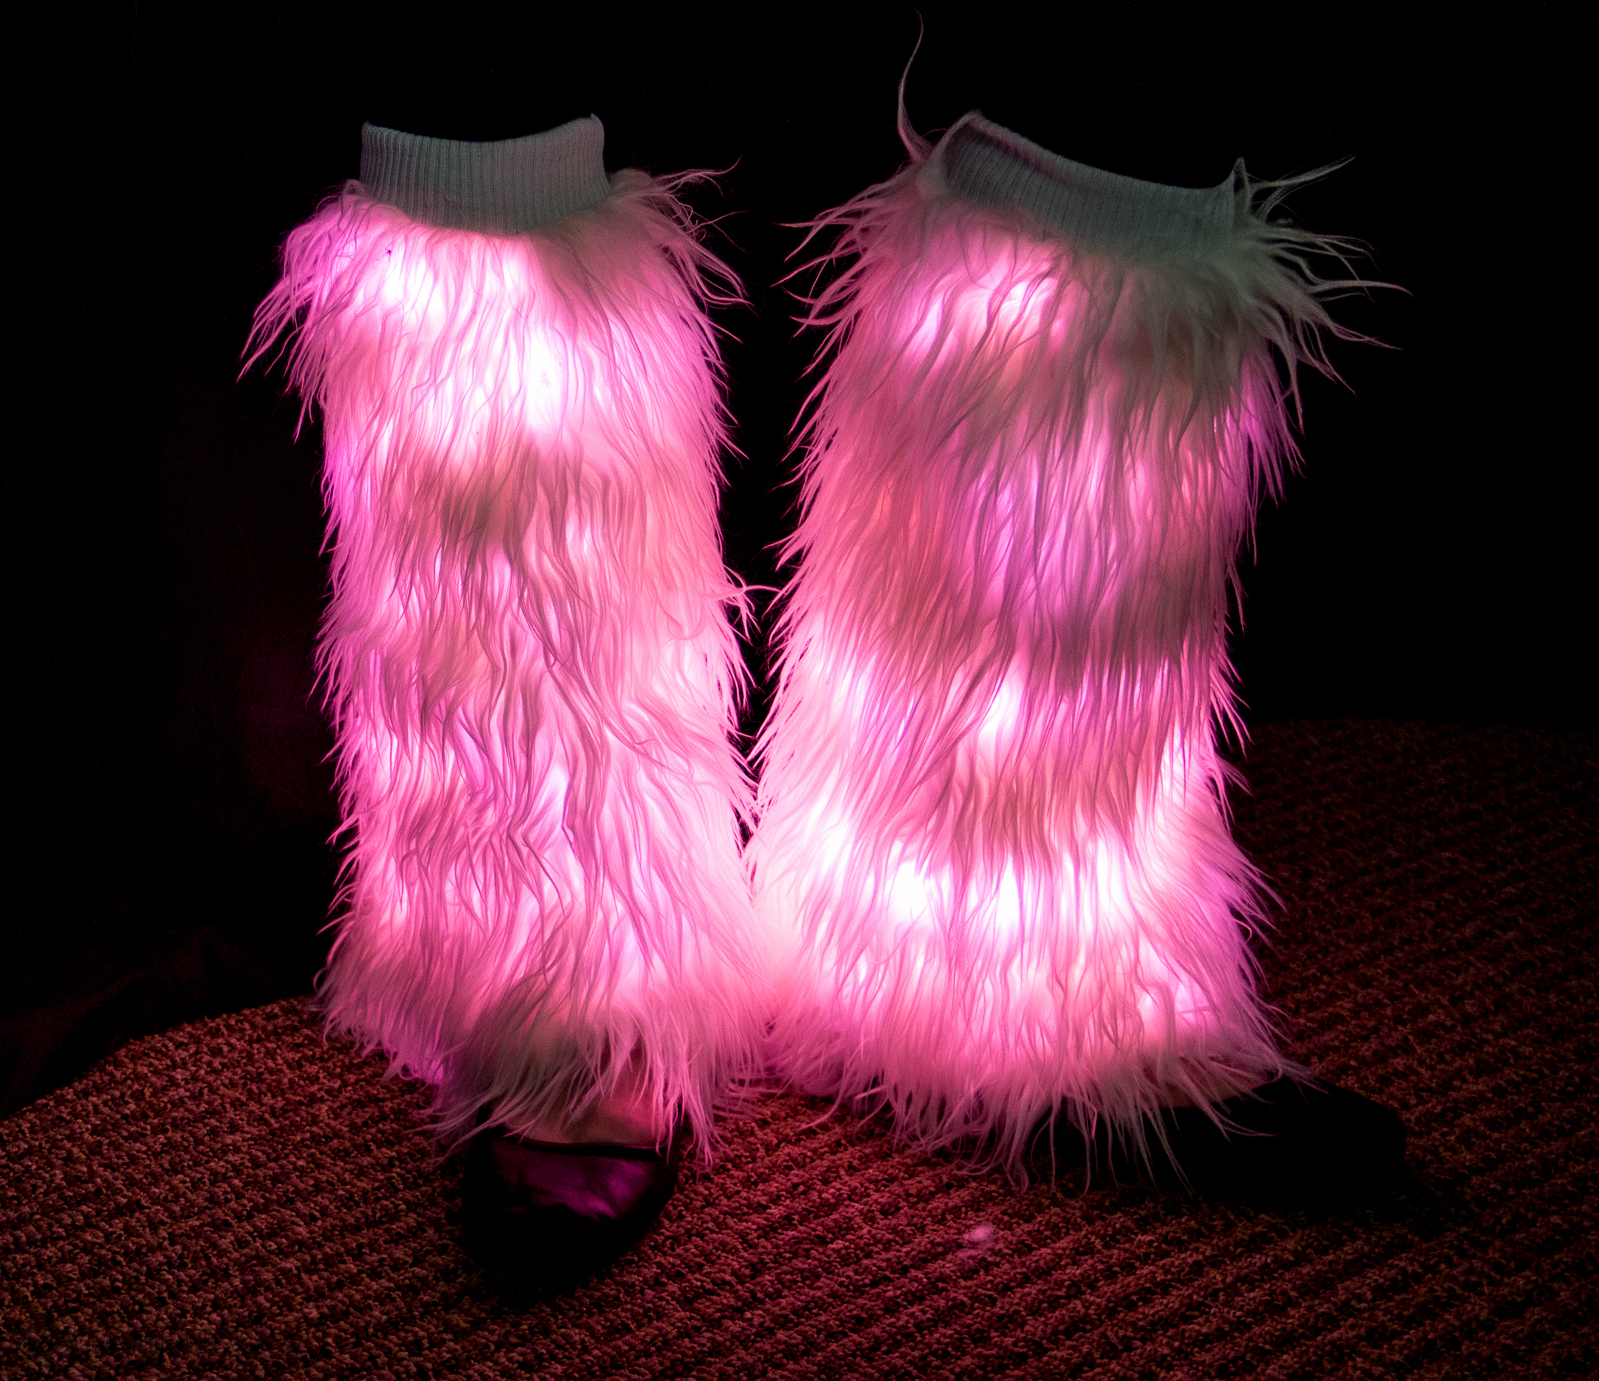 Light Up Leg Warmers Eternity Led